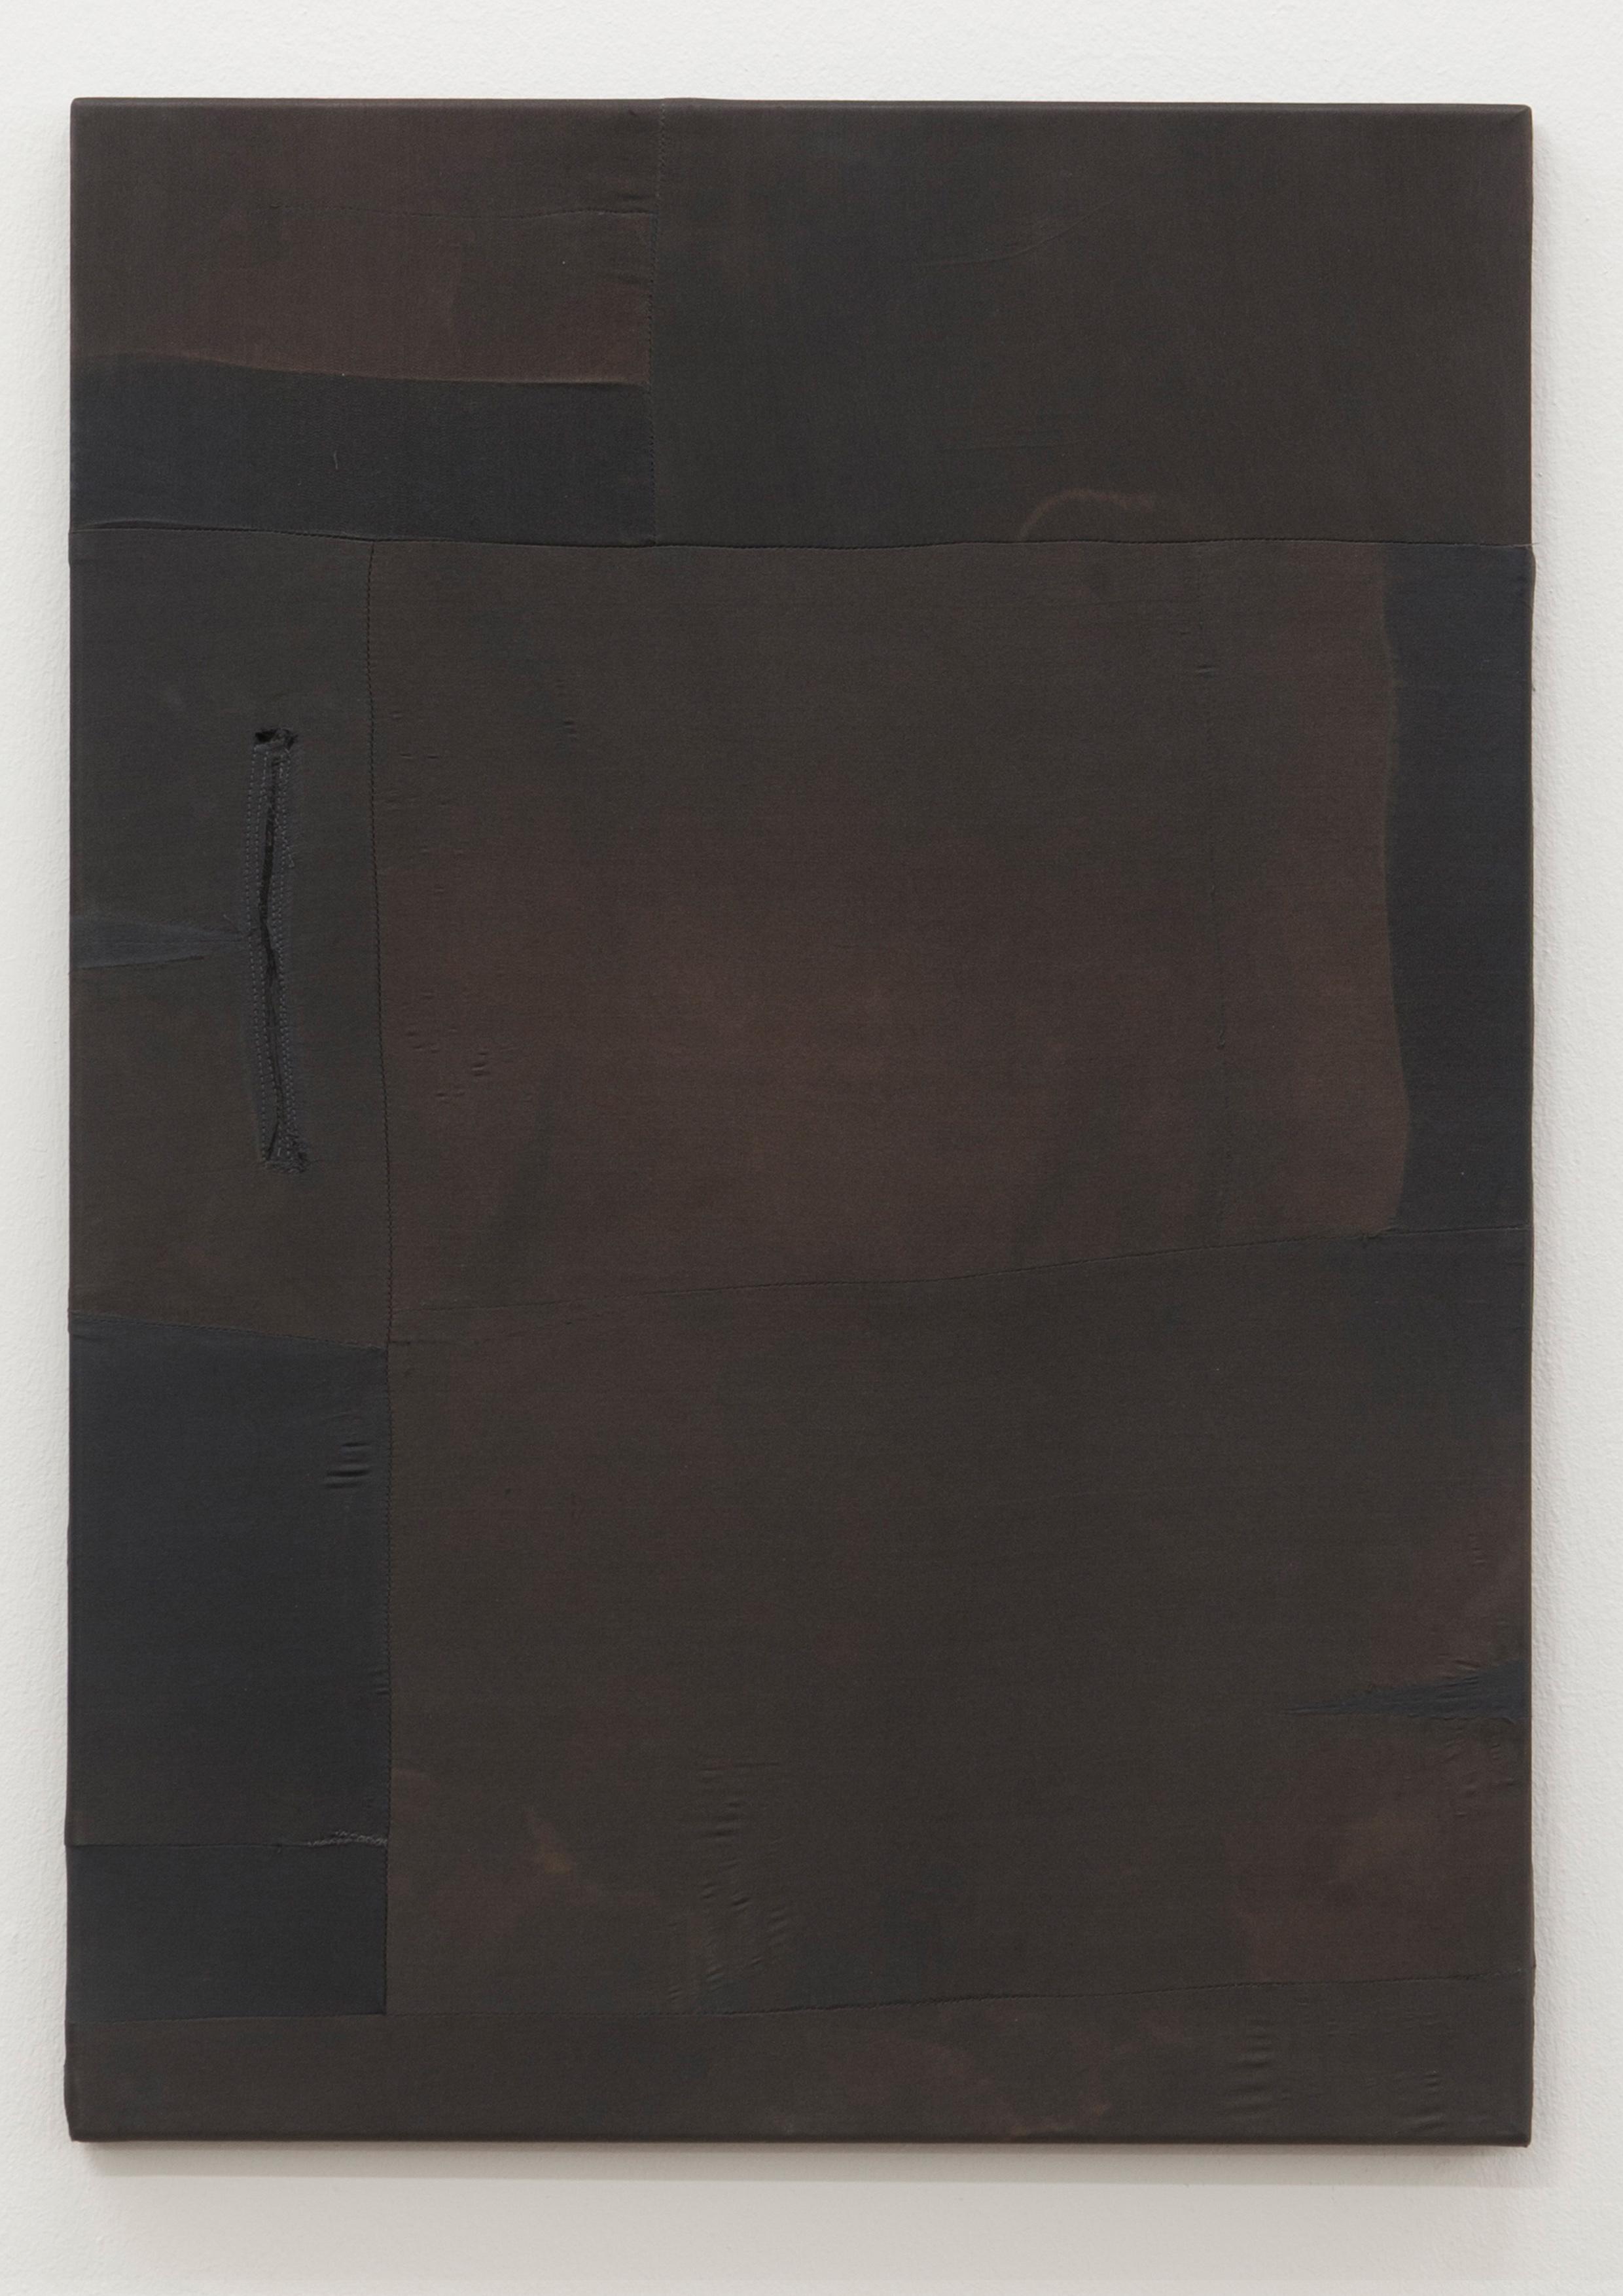 MTWTFSS12WEEKDAY (2012-2014) Artist's silk pants on stretcher (back) 88,5 x 72,5 cm